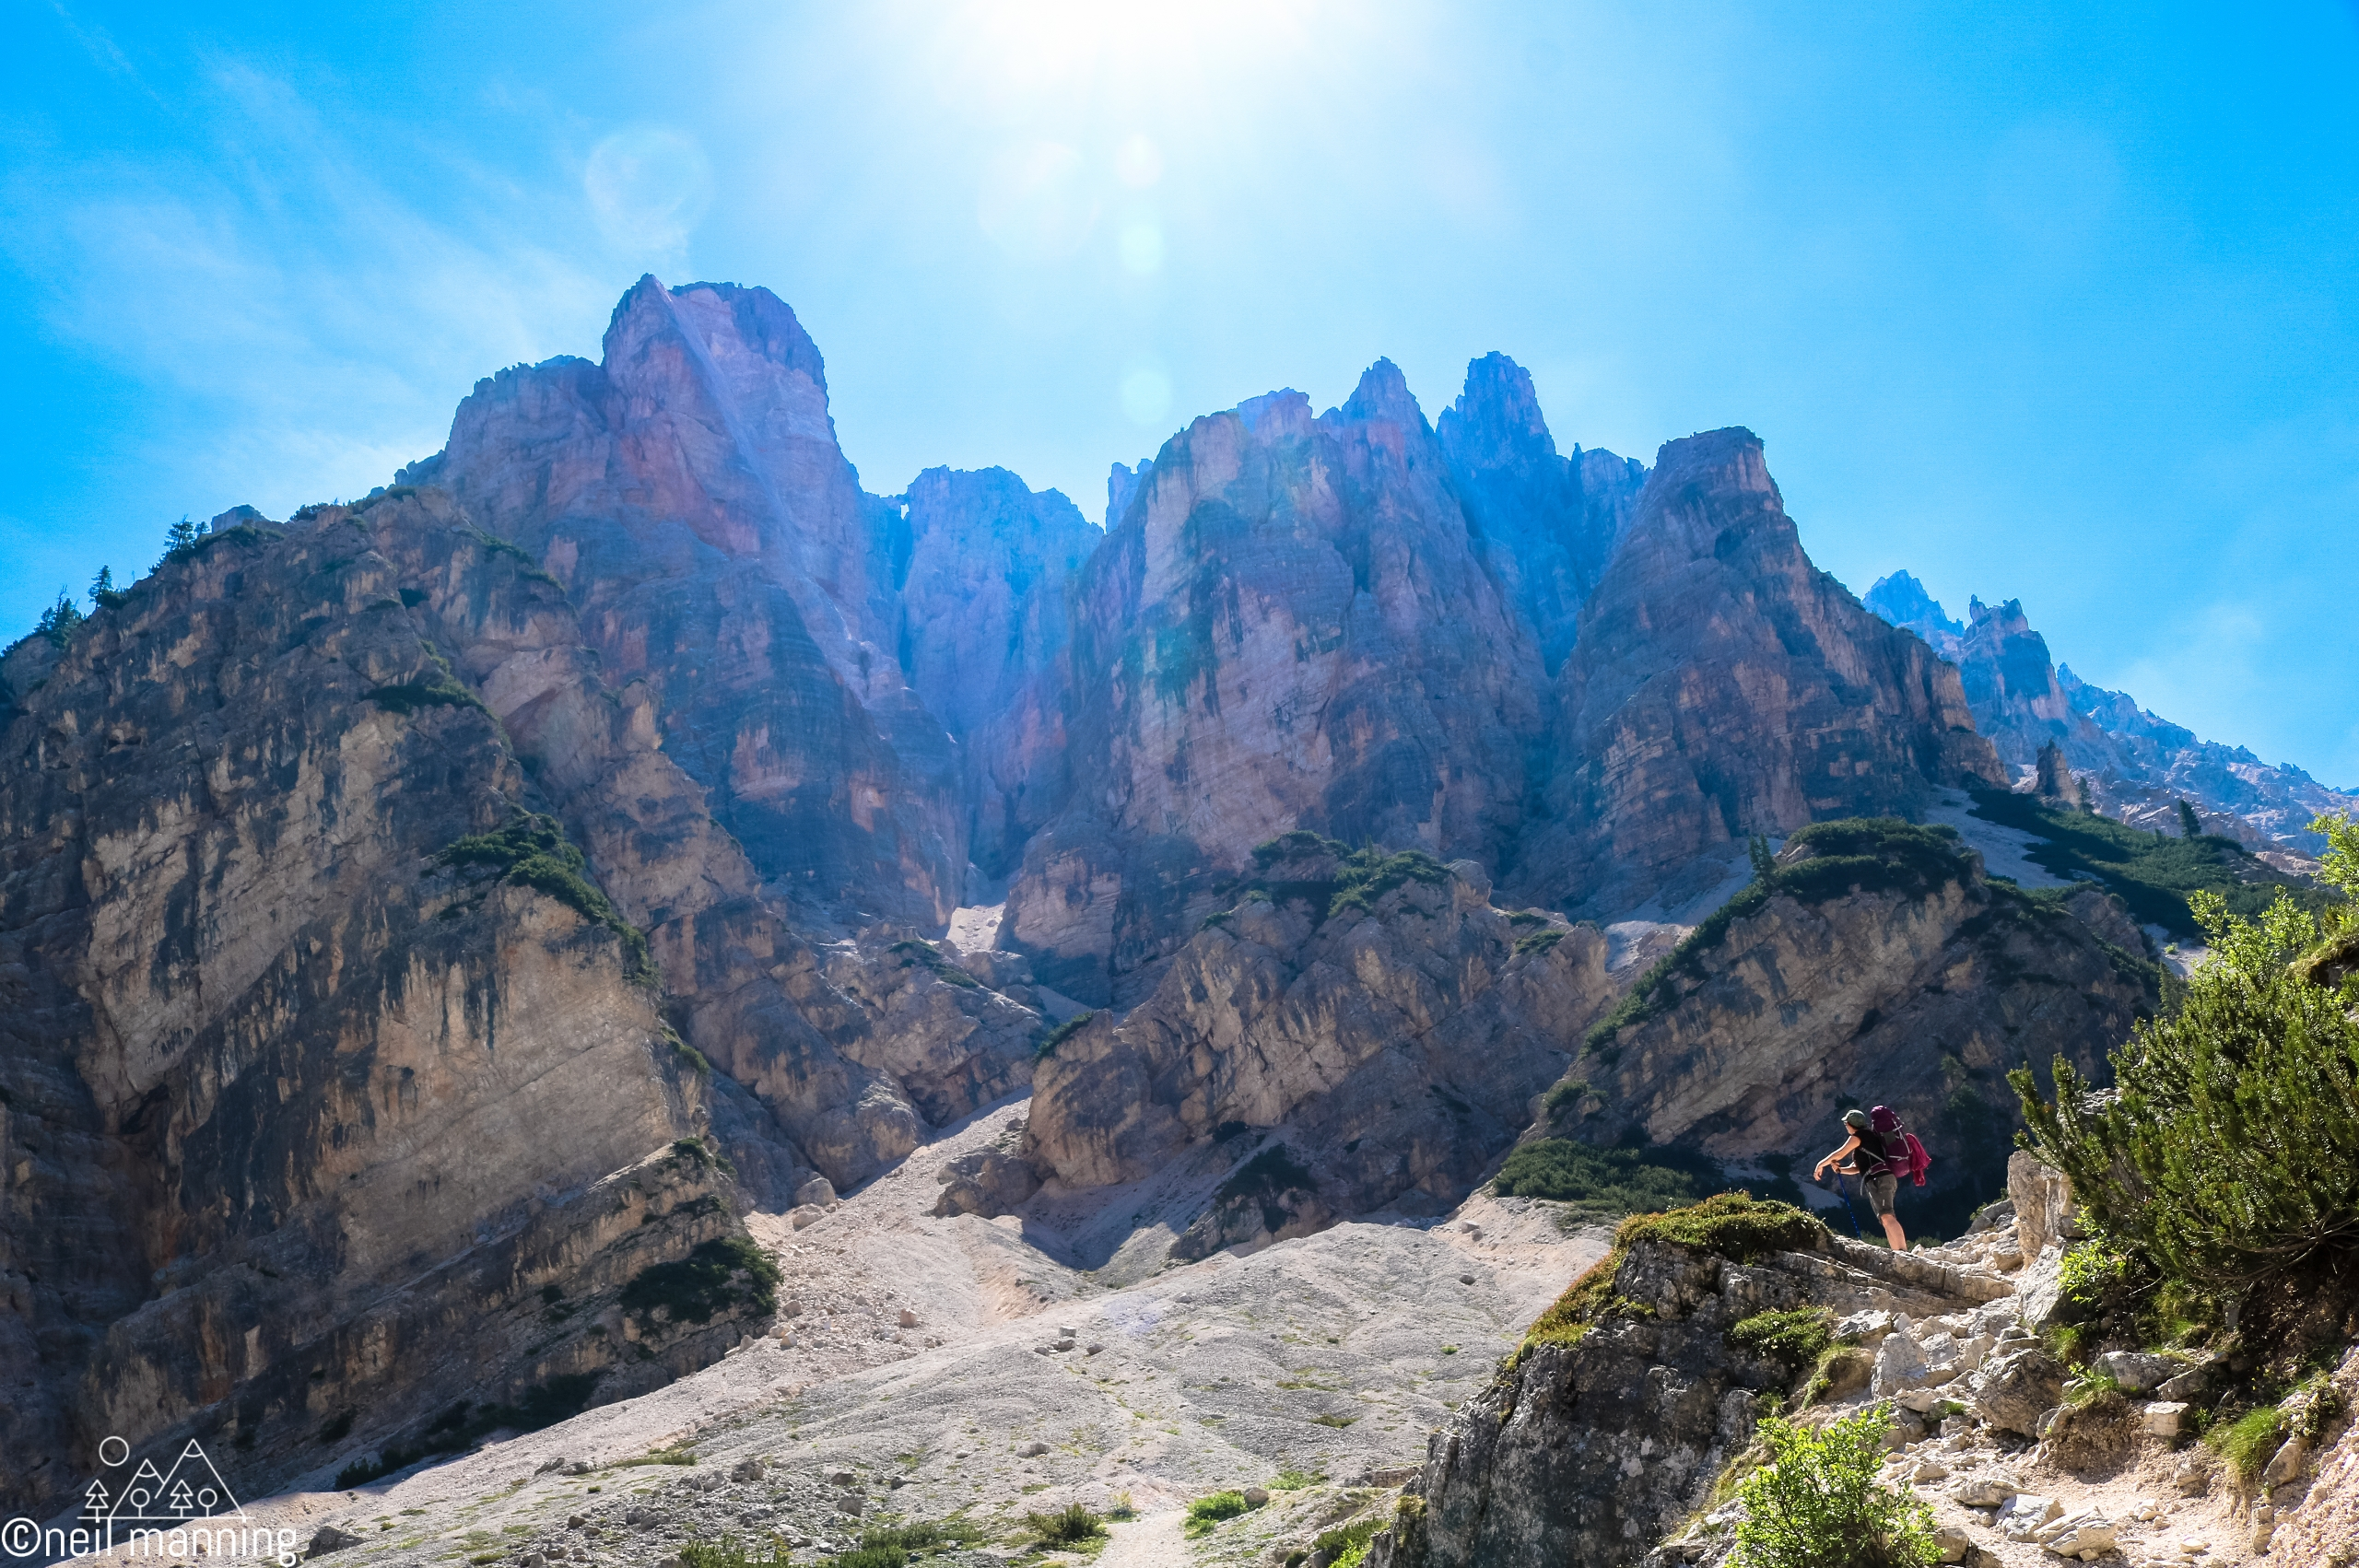 Neil Manning - mountains, dolomiti - the-wooks | ello